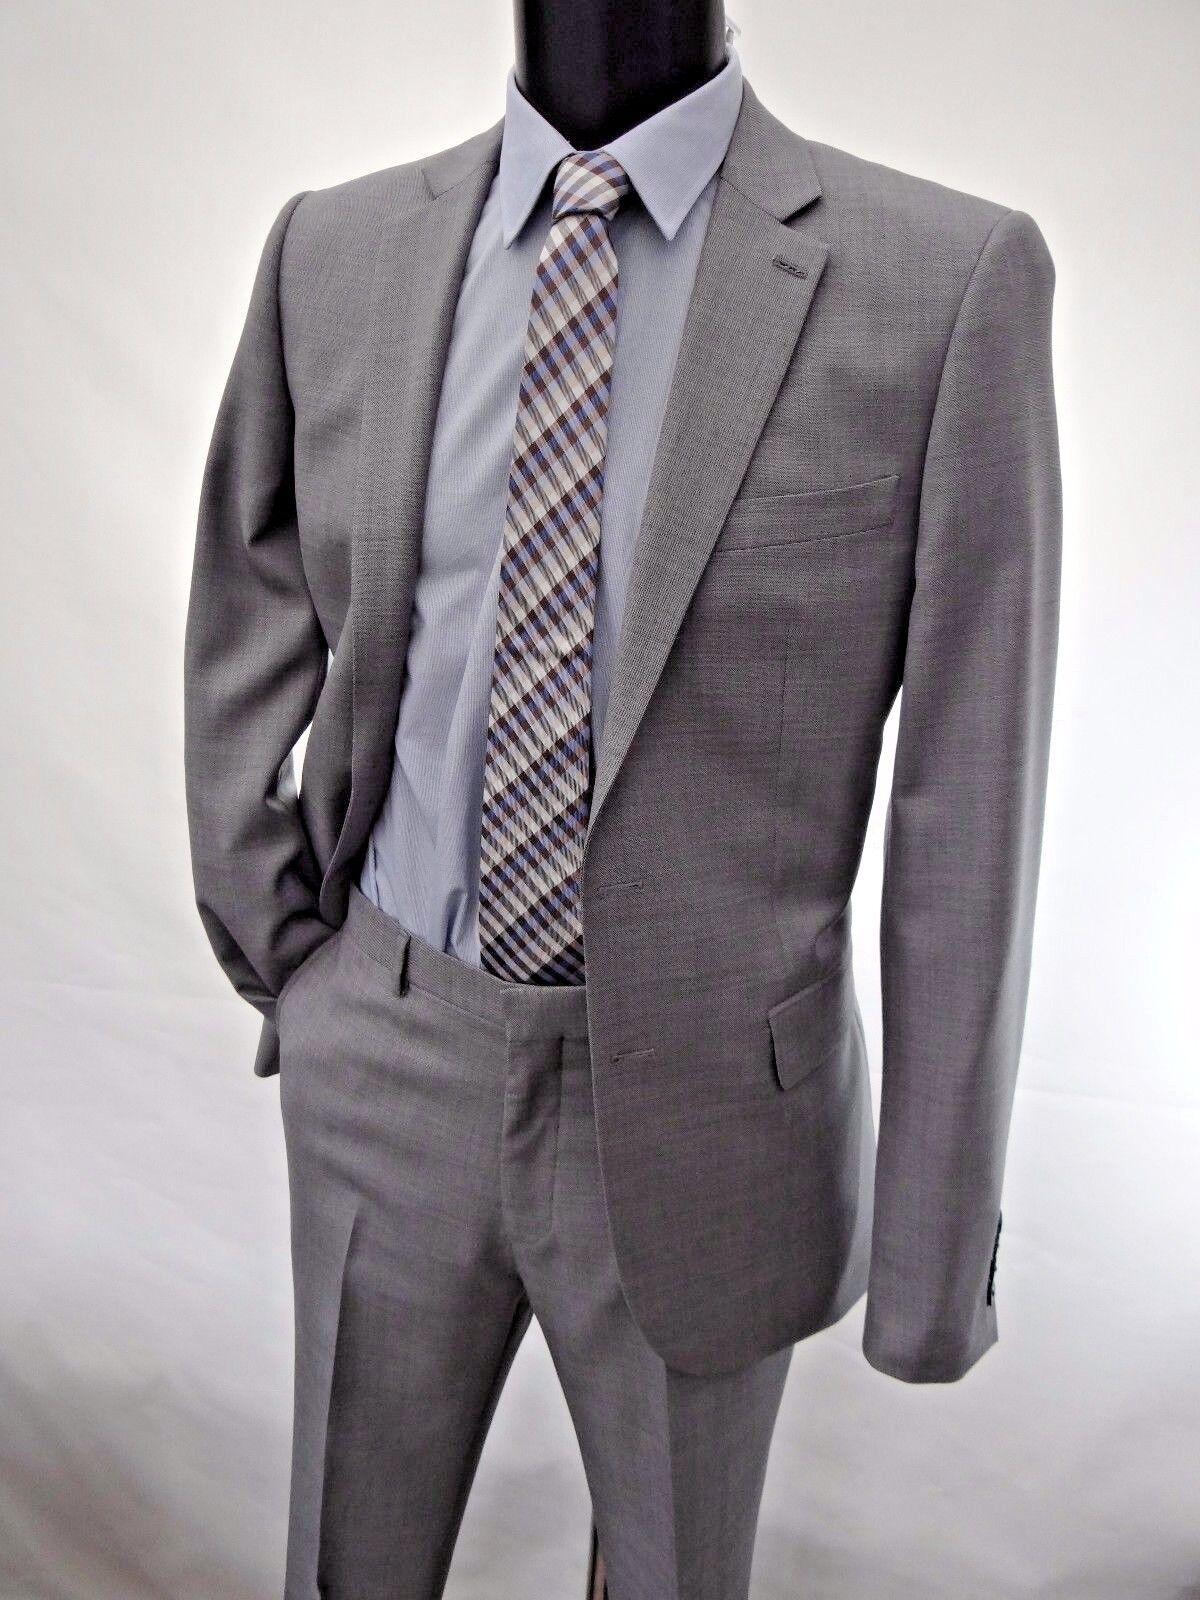 Jaeger Gris Gris Jaeger Moyen Moderne Fit Costume Tailles UK 36 L BNWT RRP £ 349 51b0fe